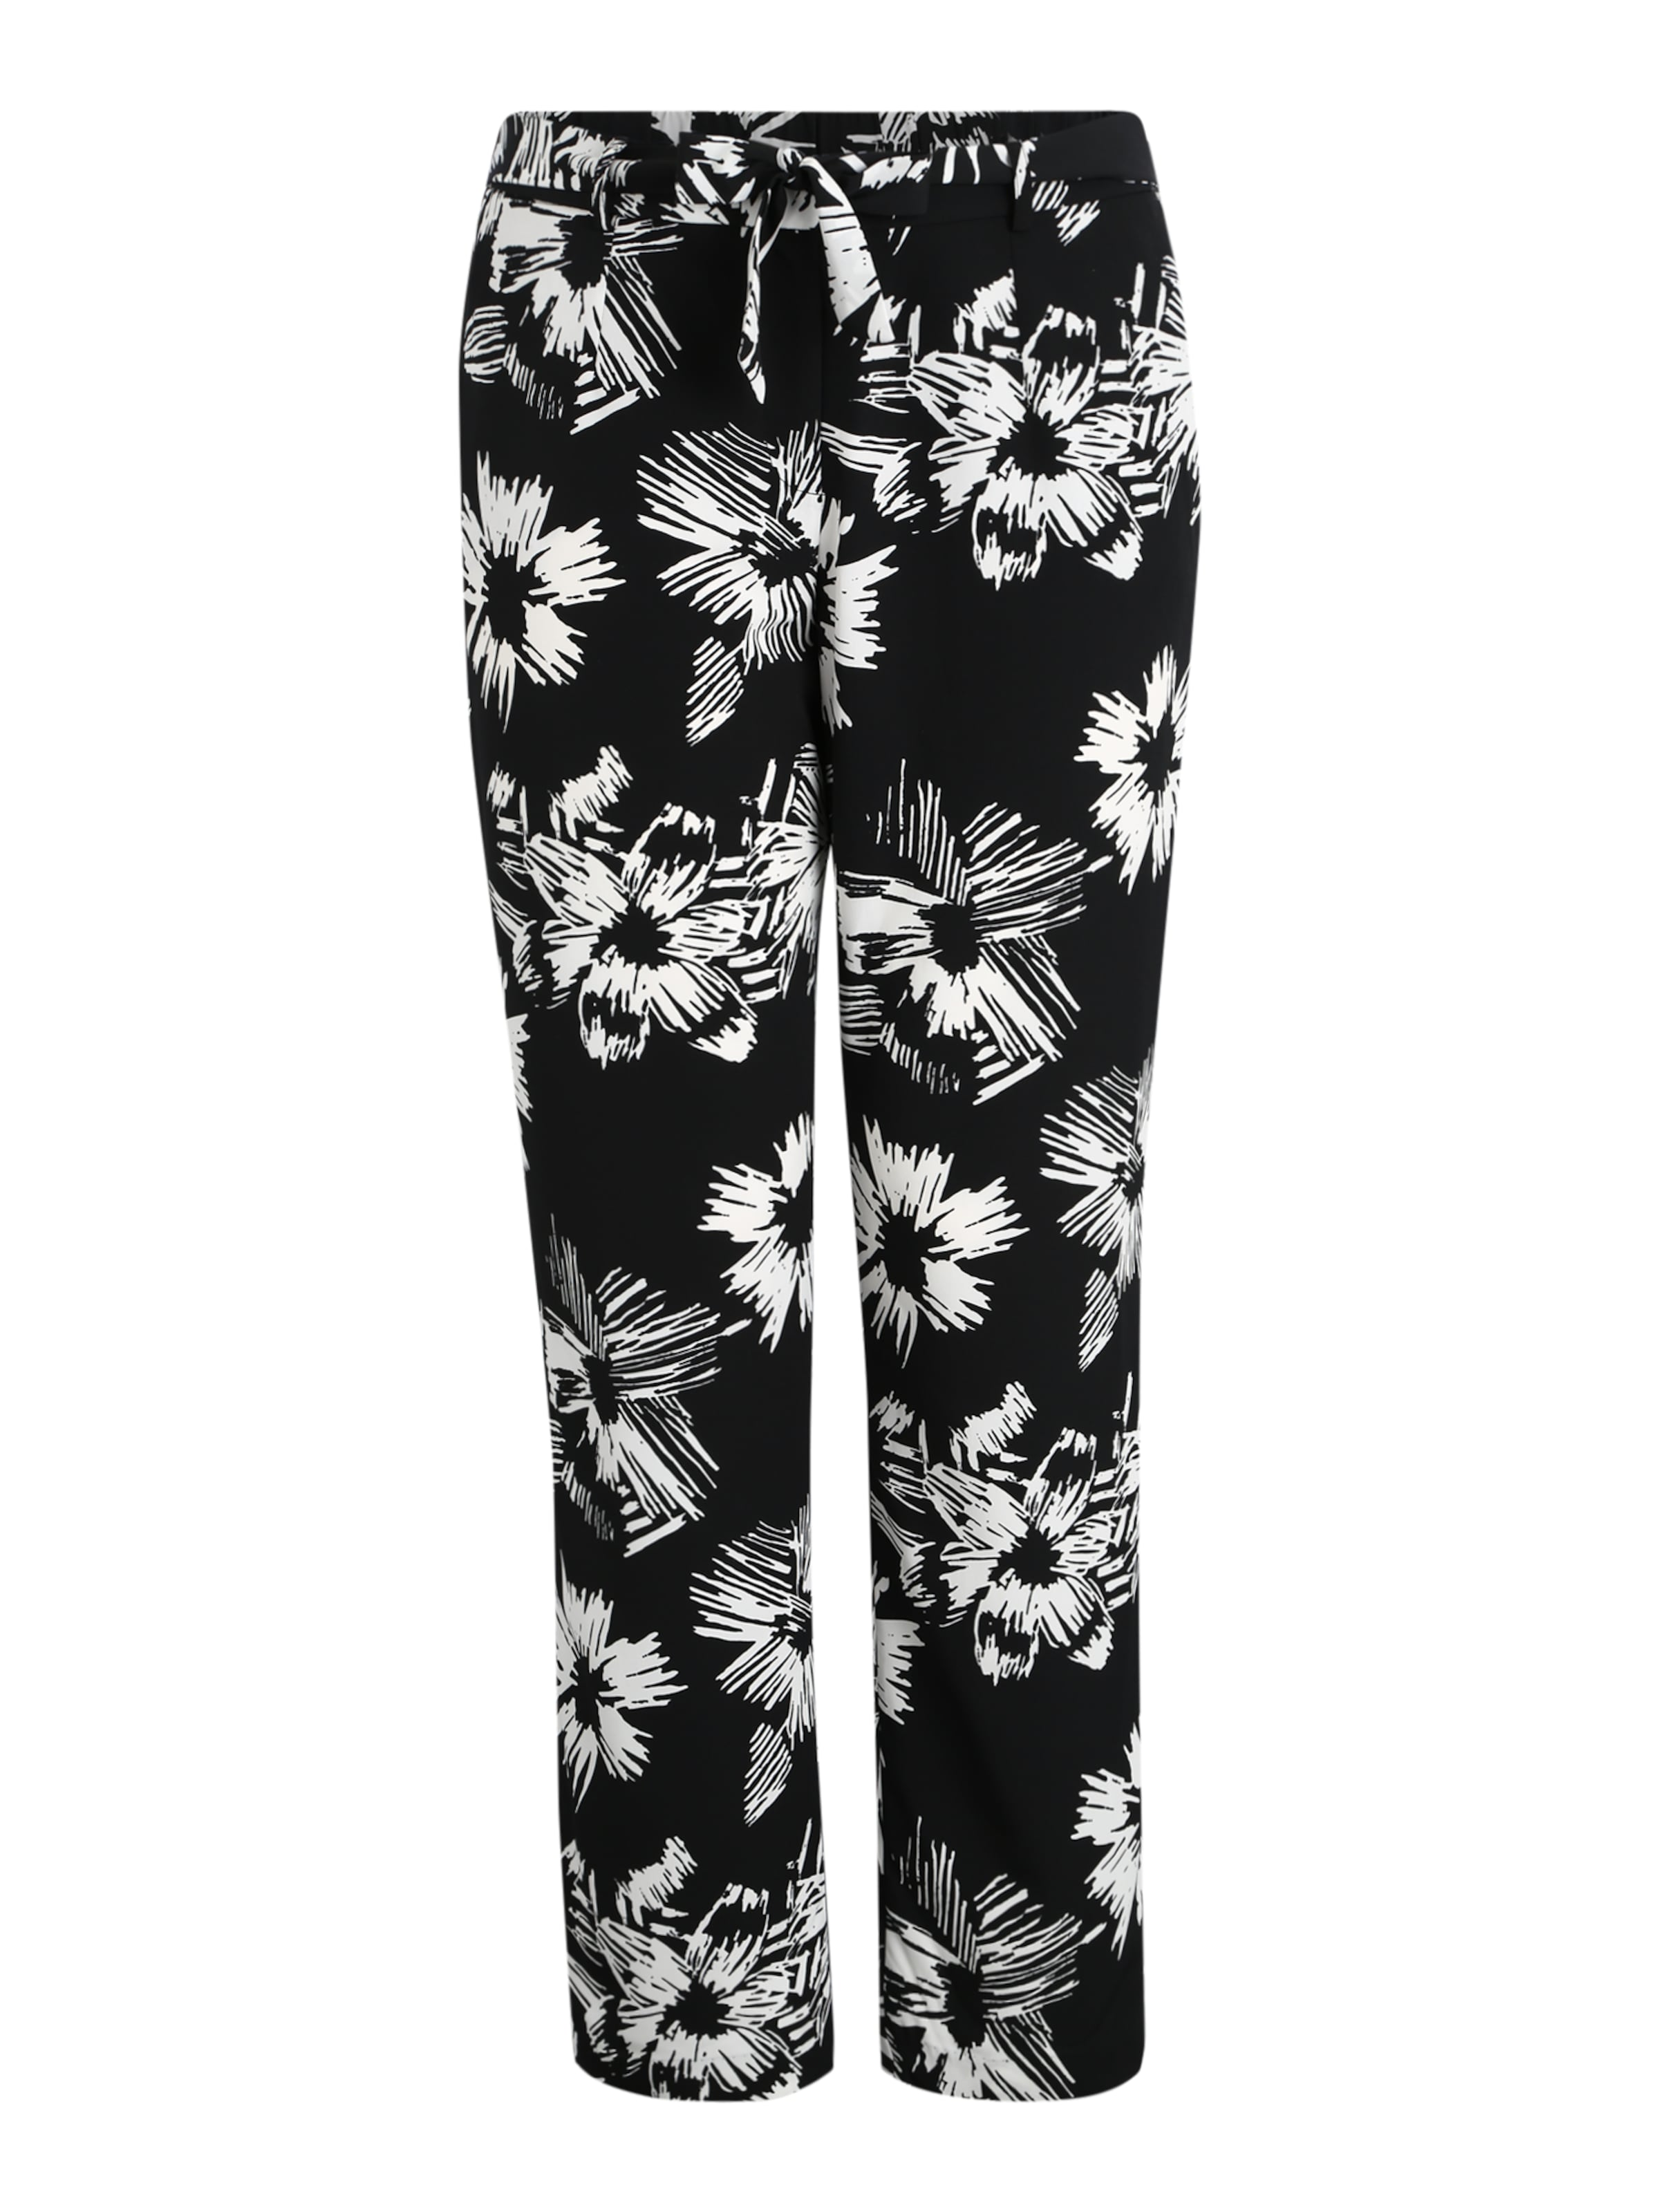 Noir Pantalon Pantalon En Triangle Triangle En 80wPkOXn